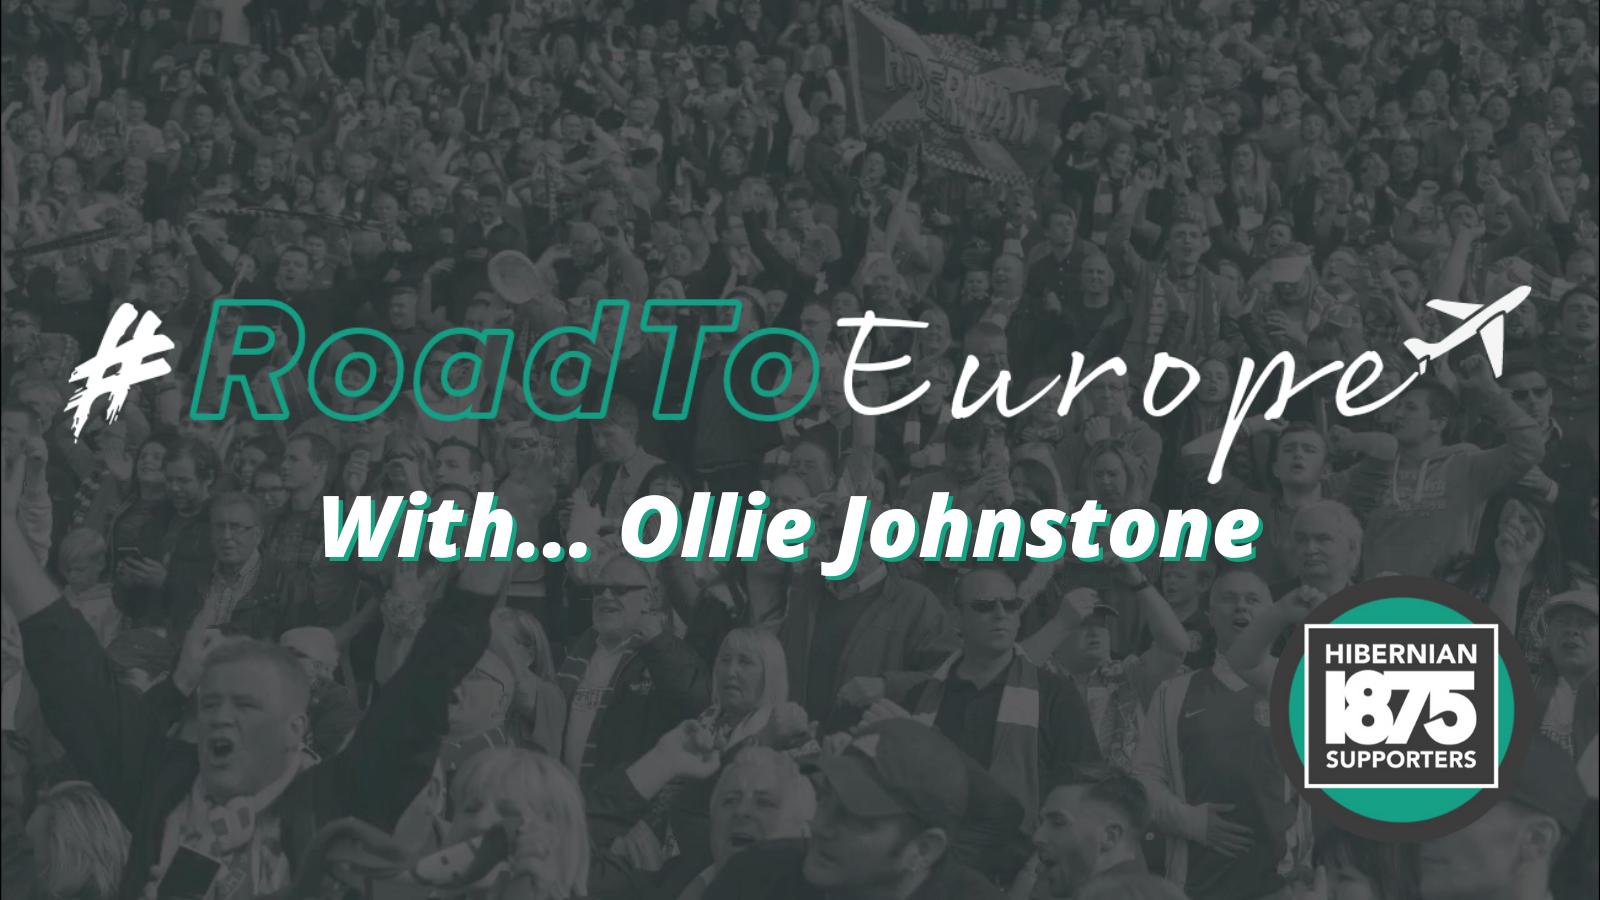 https://hiberniansupporters.co.uk/roadtoeurope-with-ollie-johnstone/